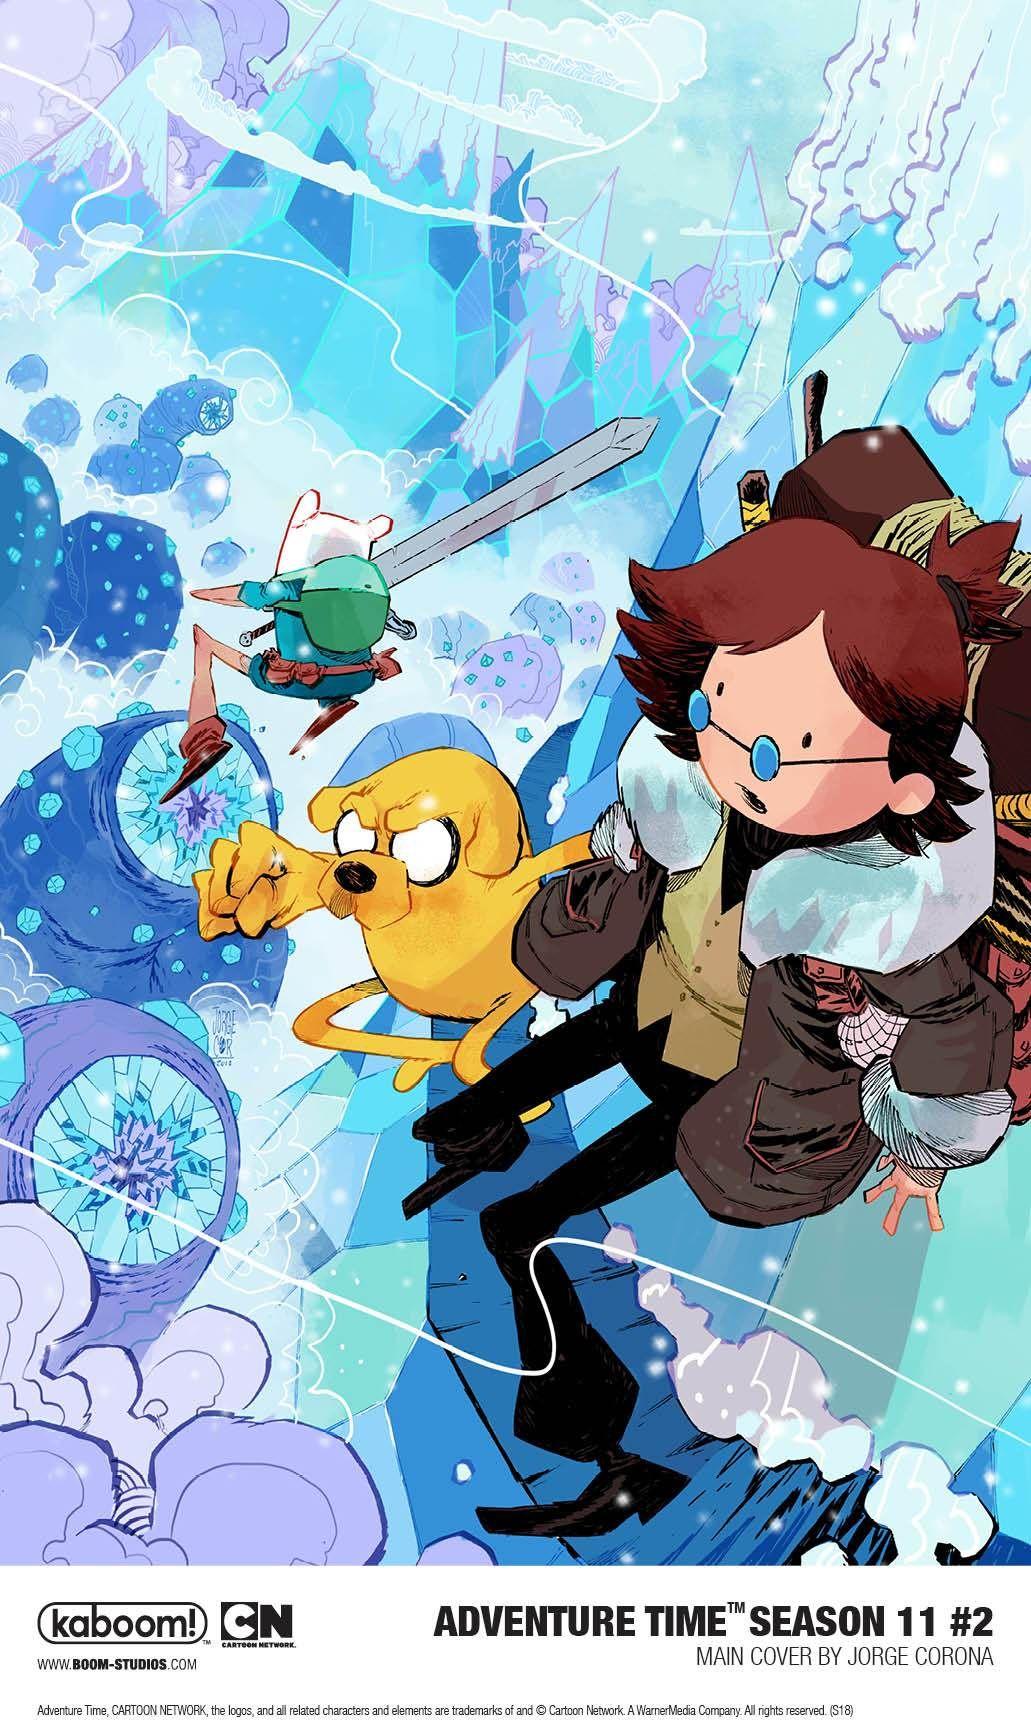 Adventure Time Season 11 2 (2019) Adventure time comics